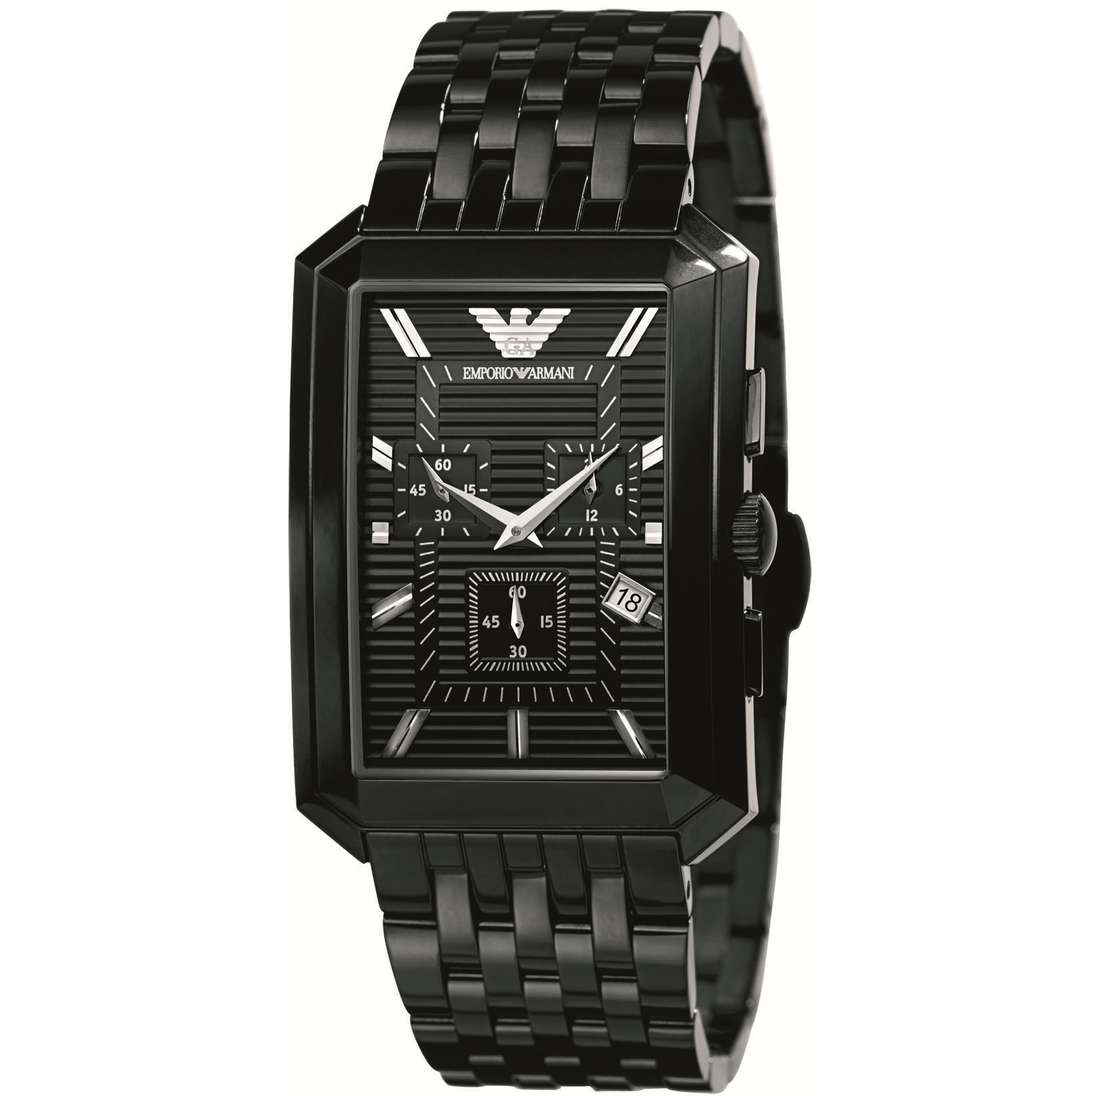 orologio cronografo uomo Emporio Armani AR0475